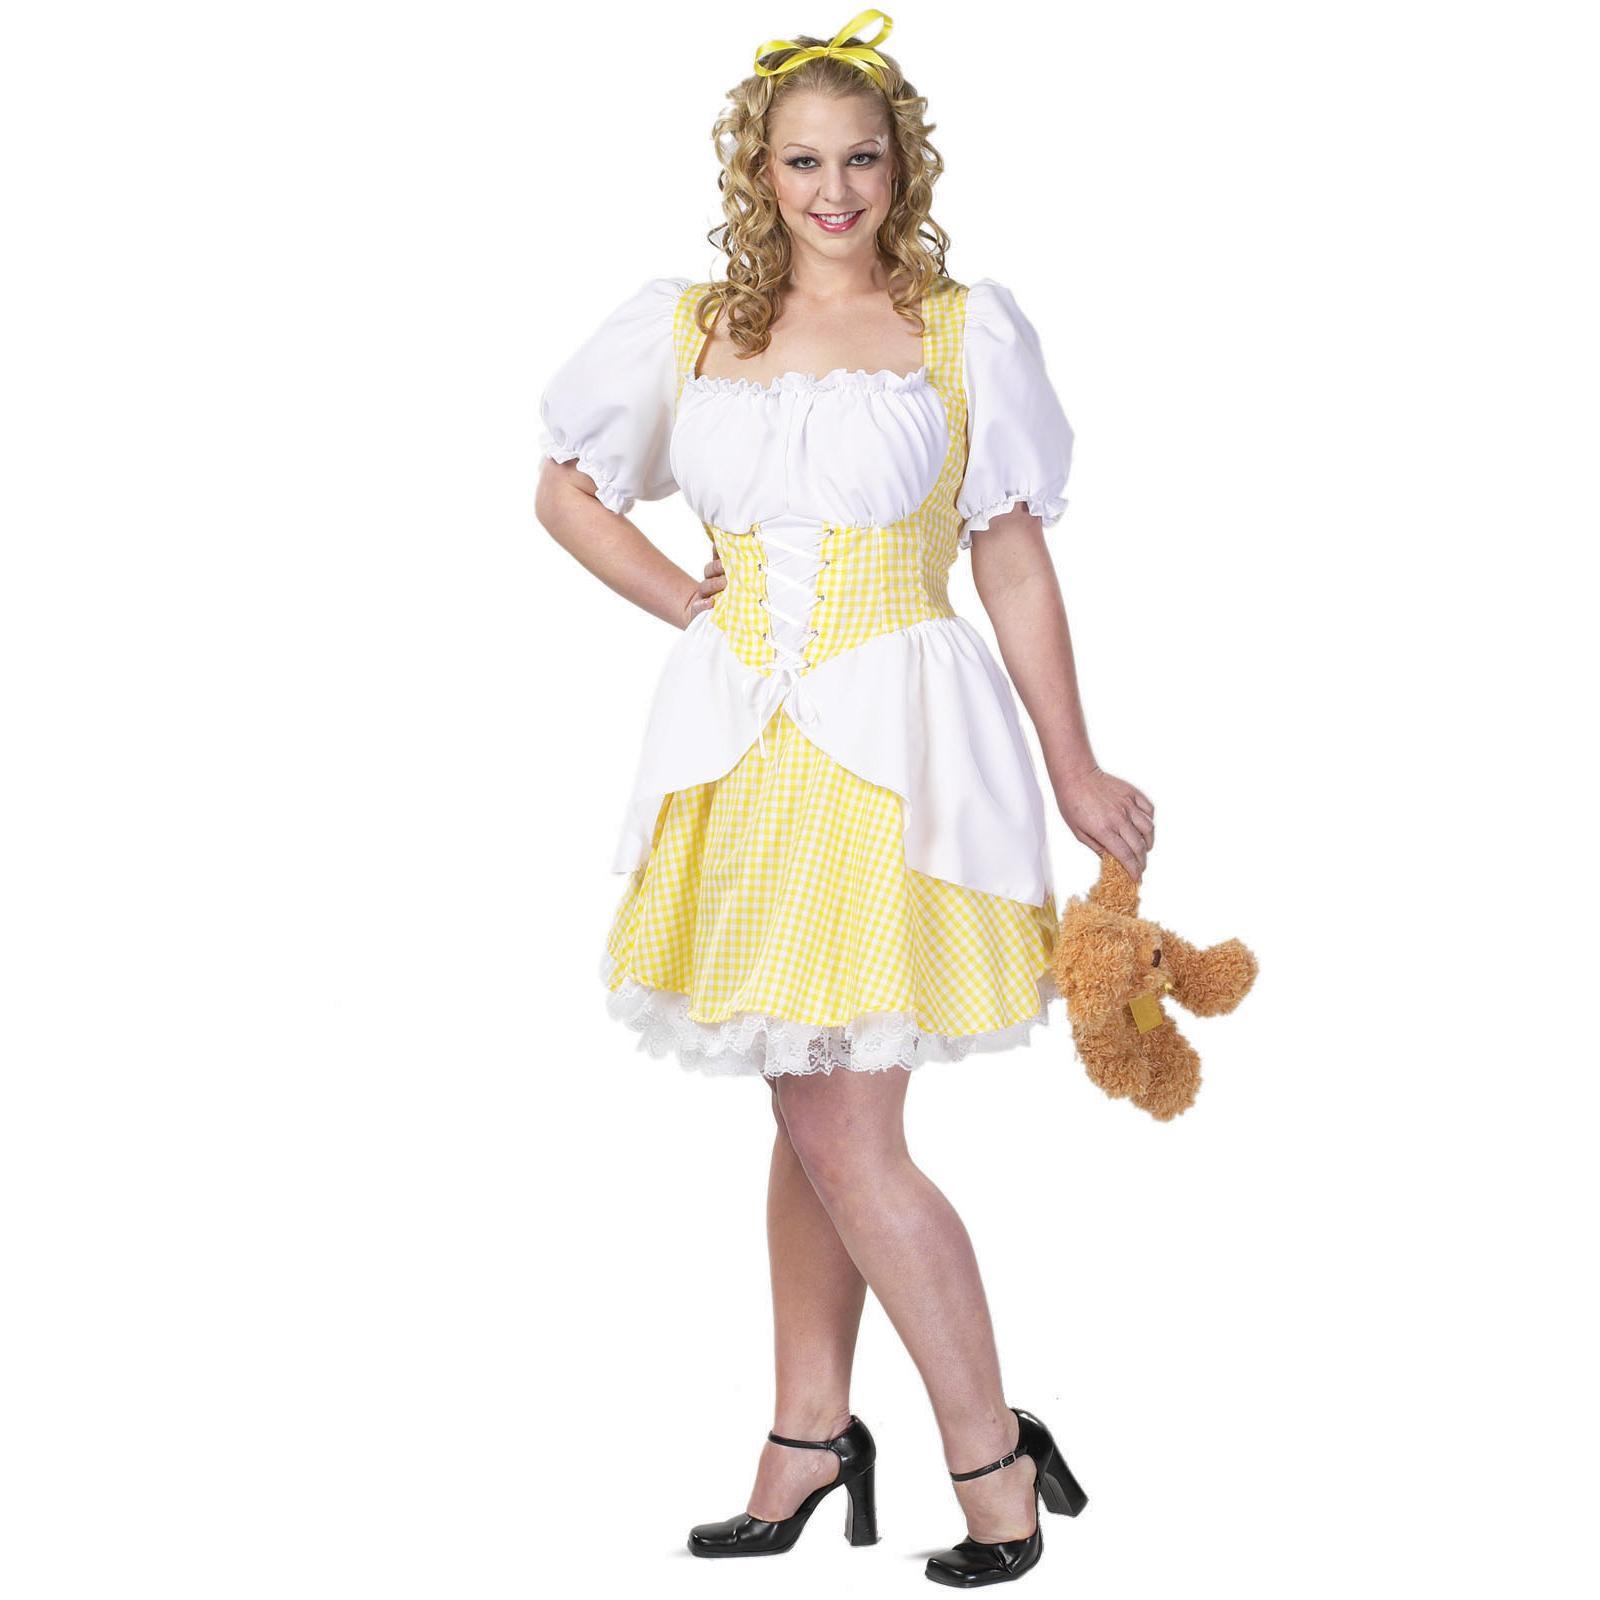 Goldilocks transform costumes props amp party supplies